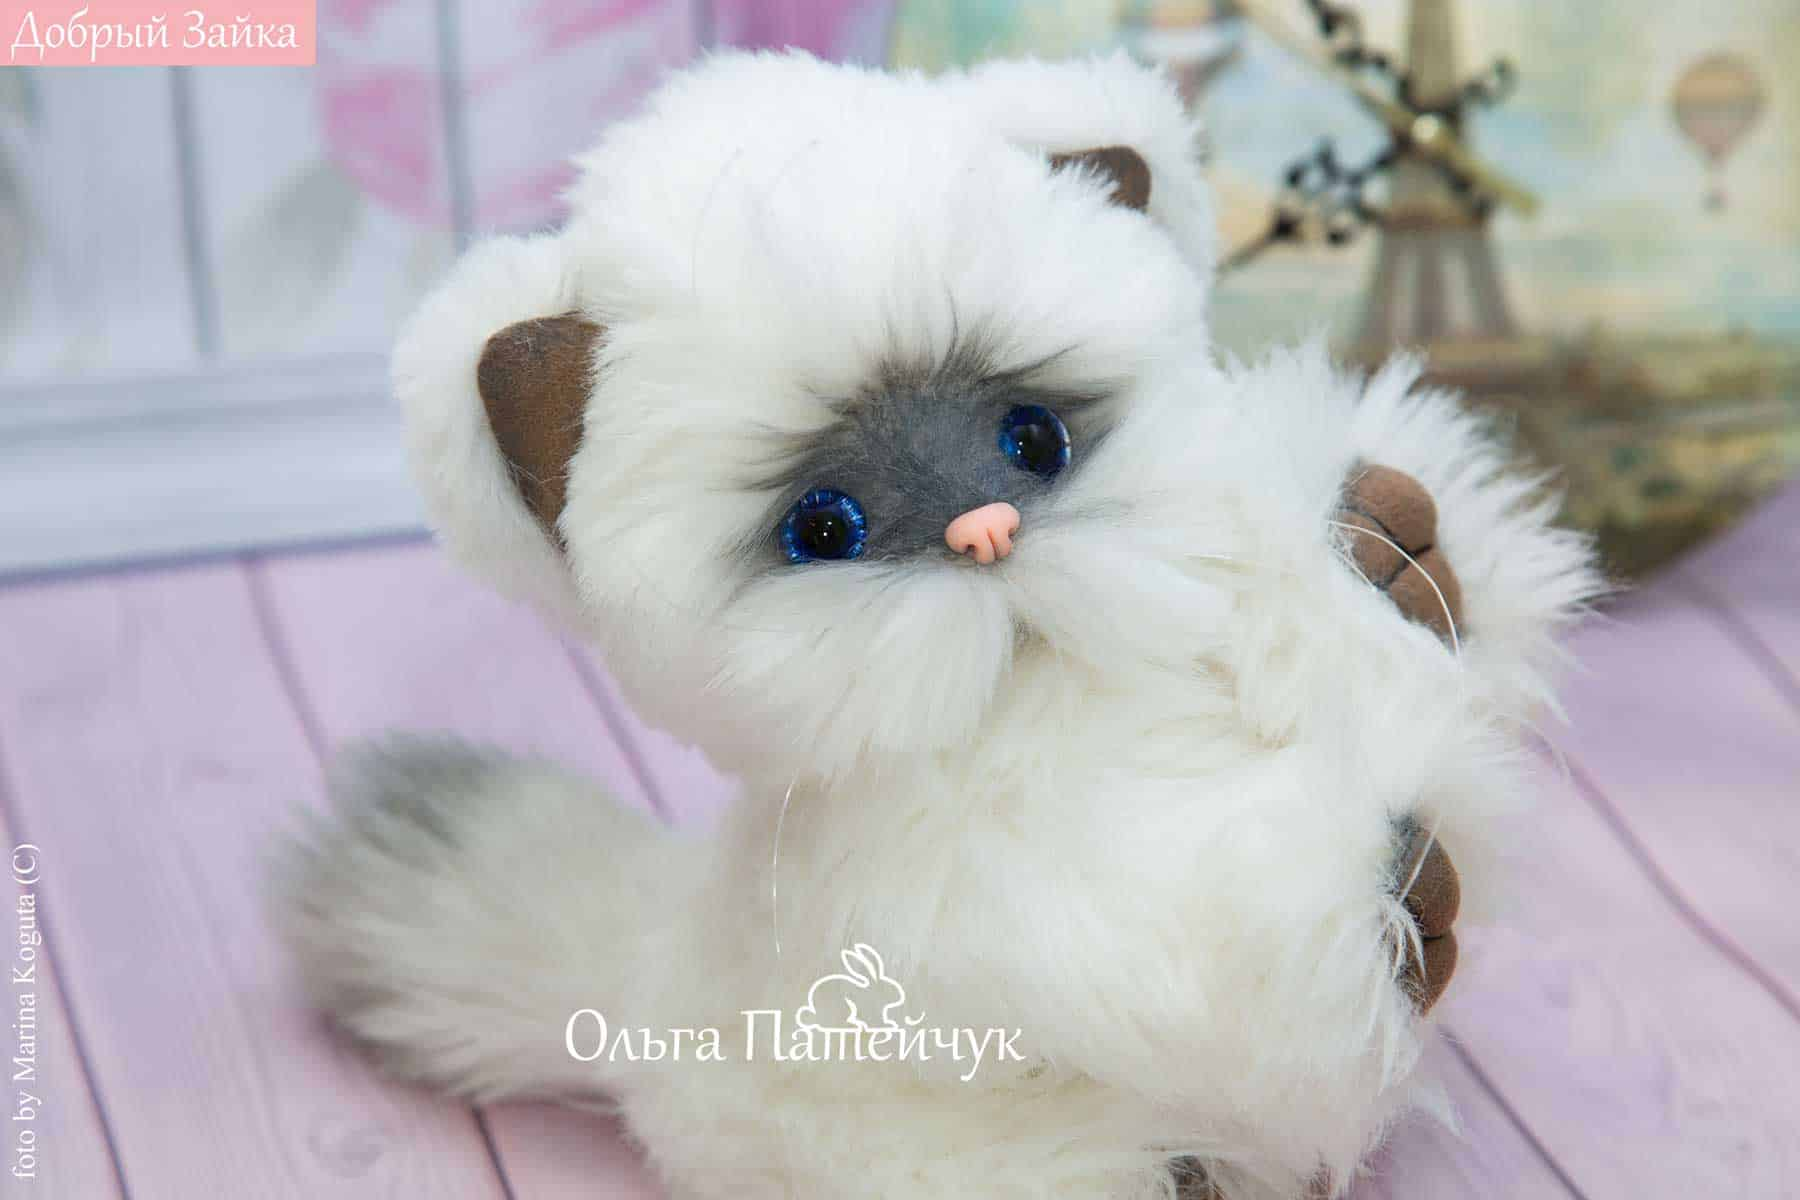 Котенок по имени Облачко